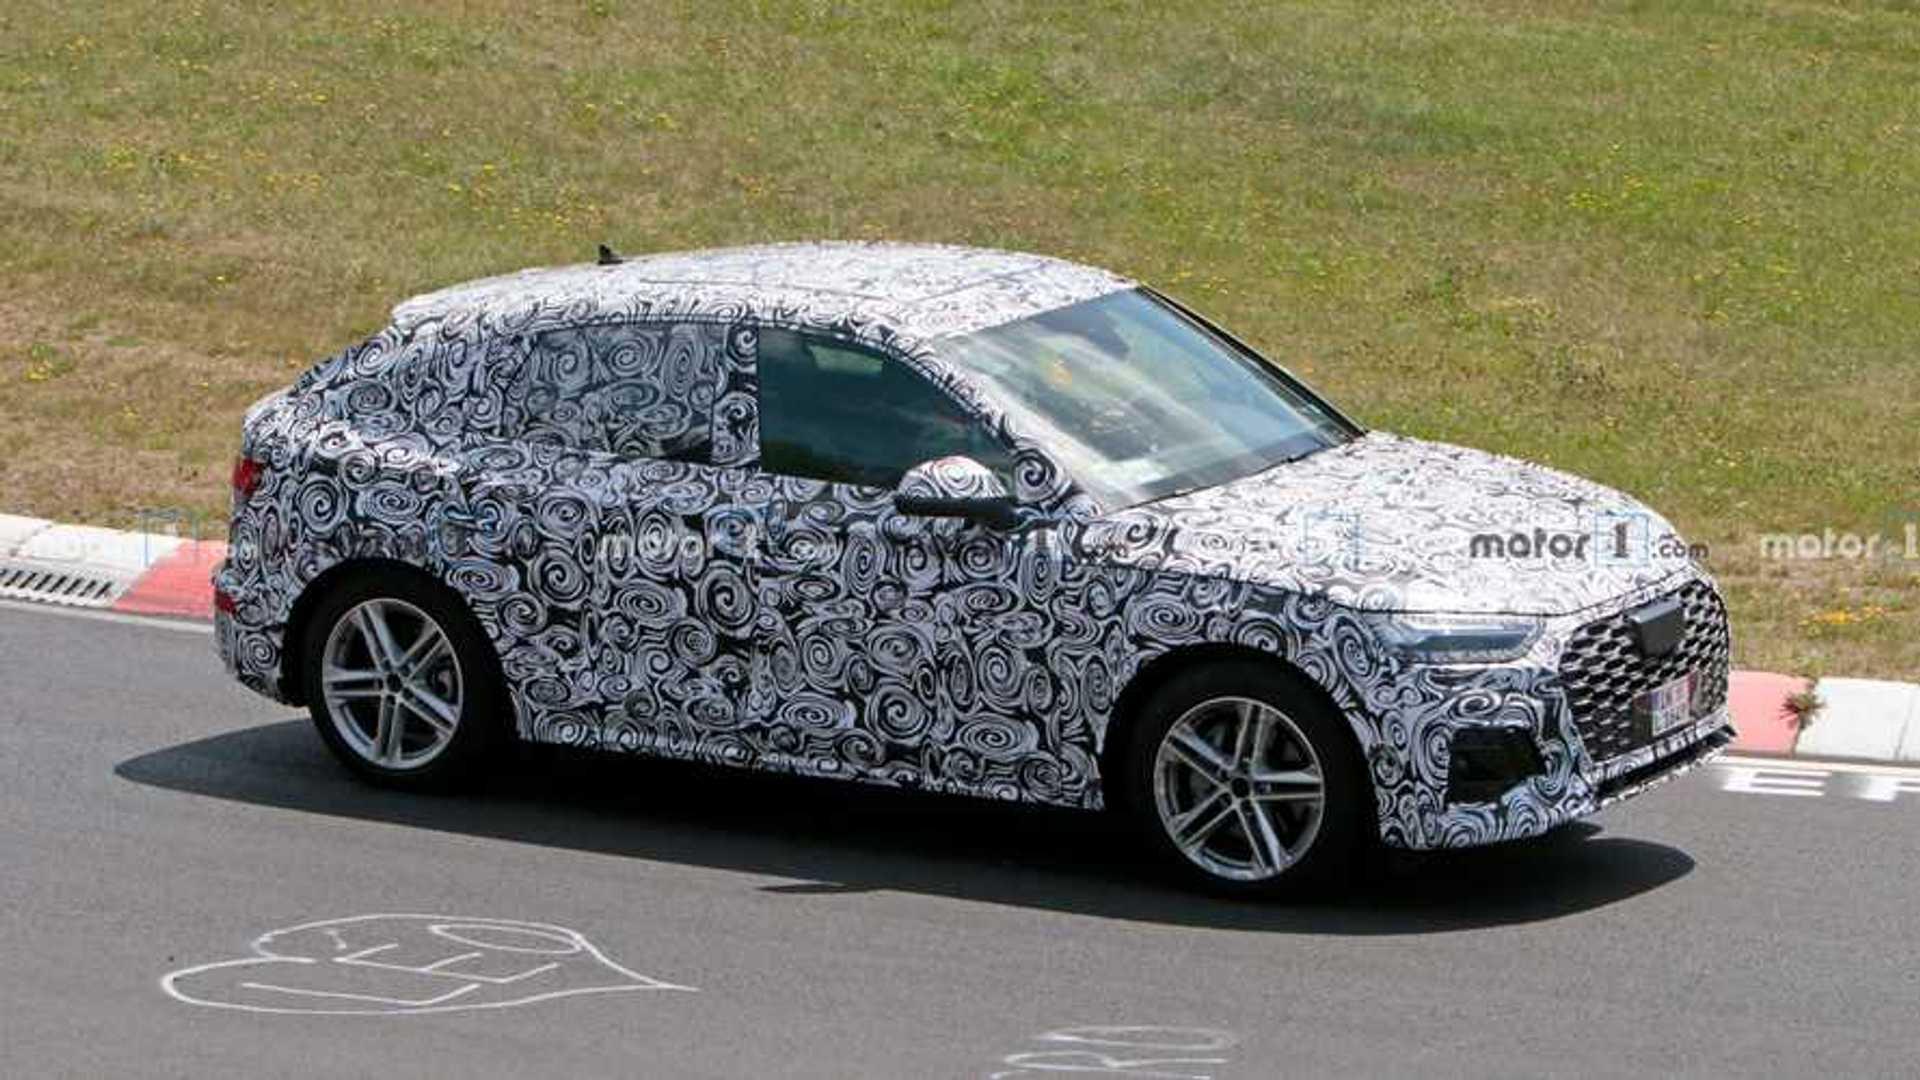 2020 - [Audi] Q5 Sportback - Page 7 2021-audi-q5-sportback-spy-photo